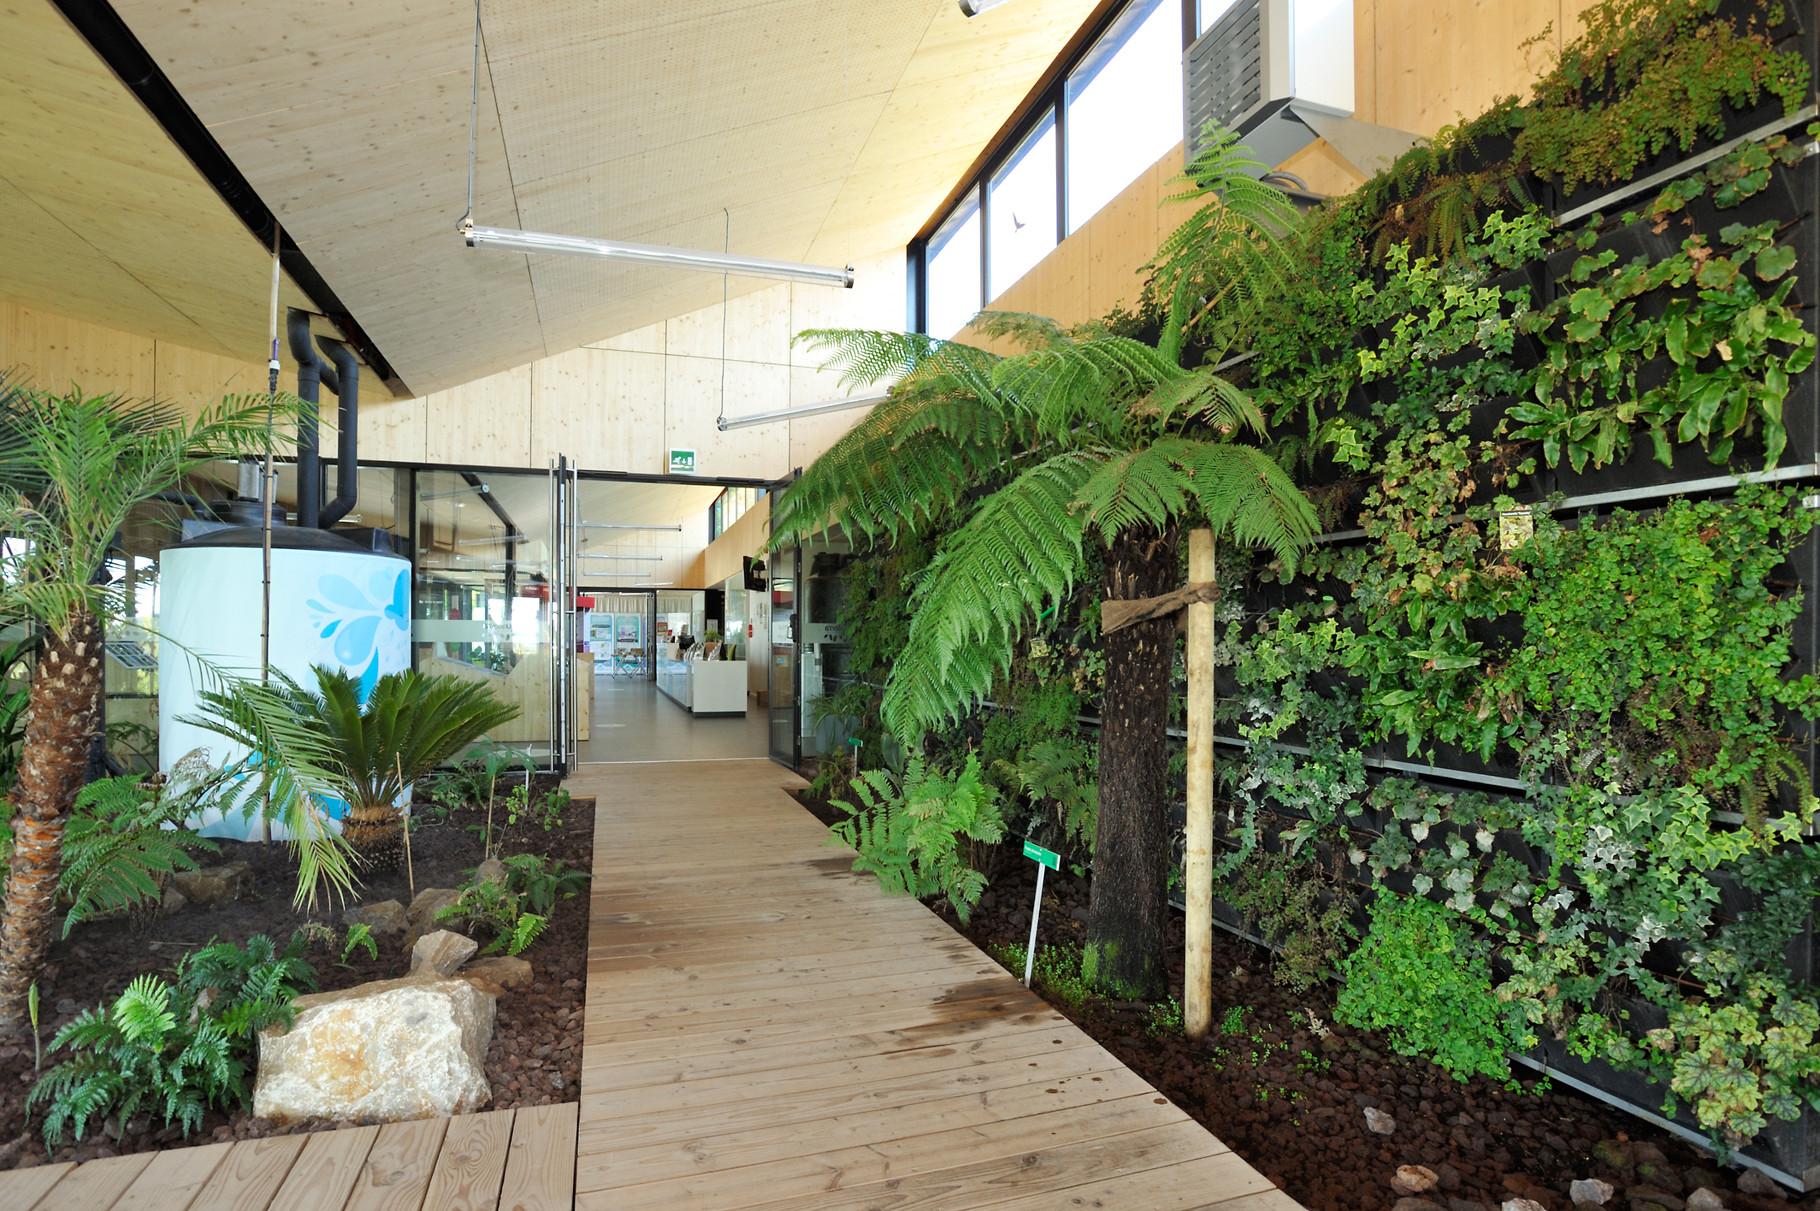 Aquaterra la Maison de l'environnement par Richard Soberka